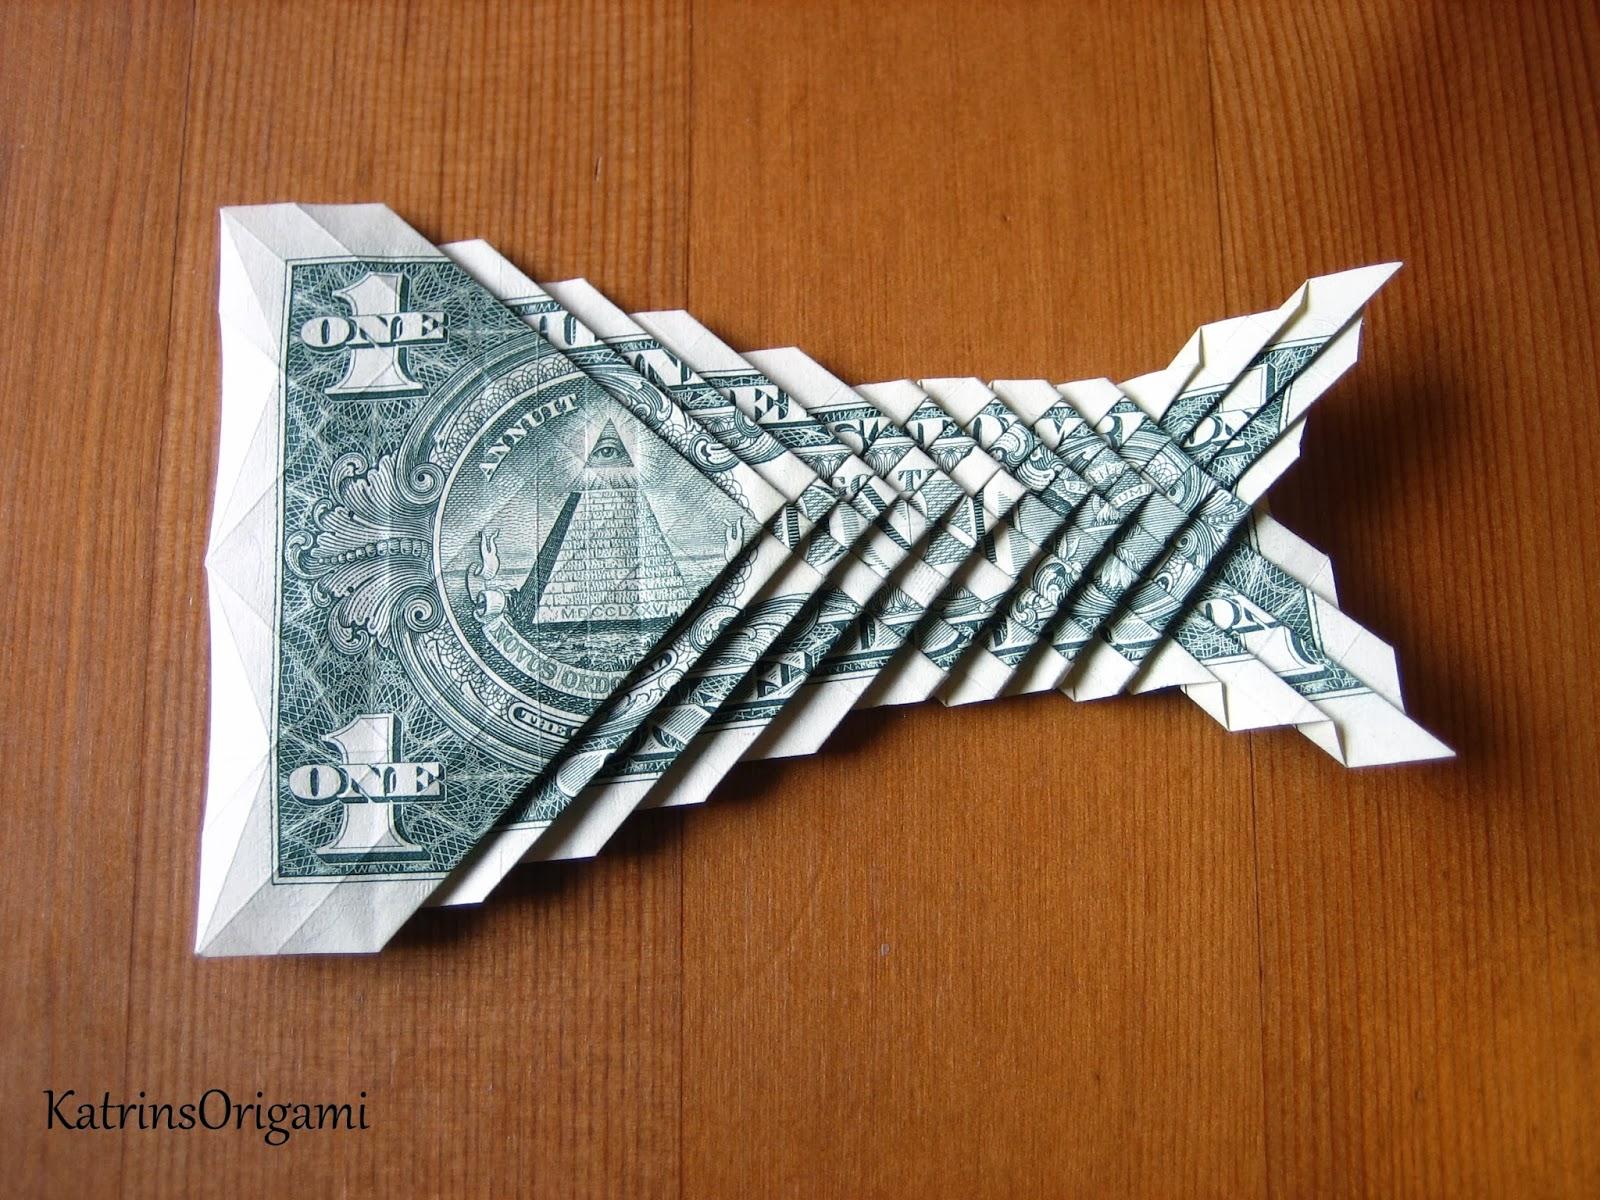 Origami die Kunst des Papierfaltens: Origami 1 $ Koi Fish - photo#17